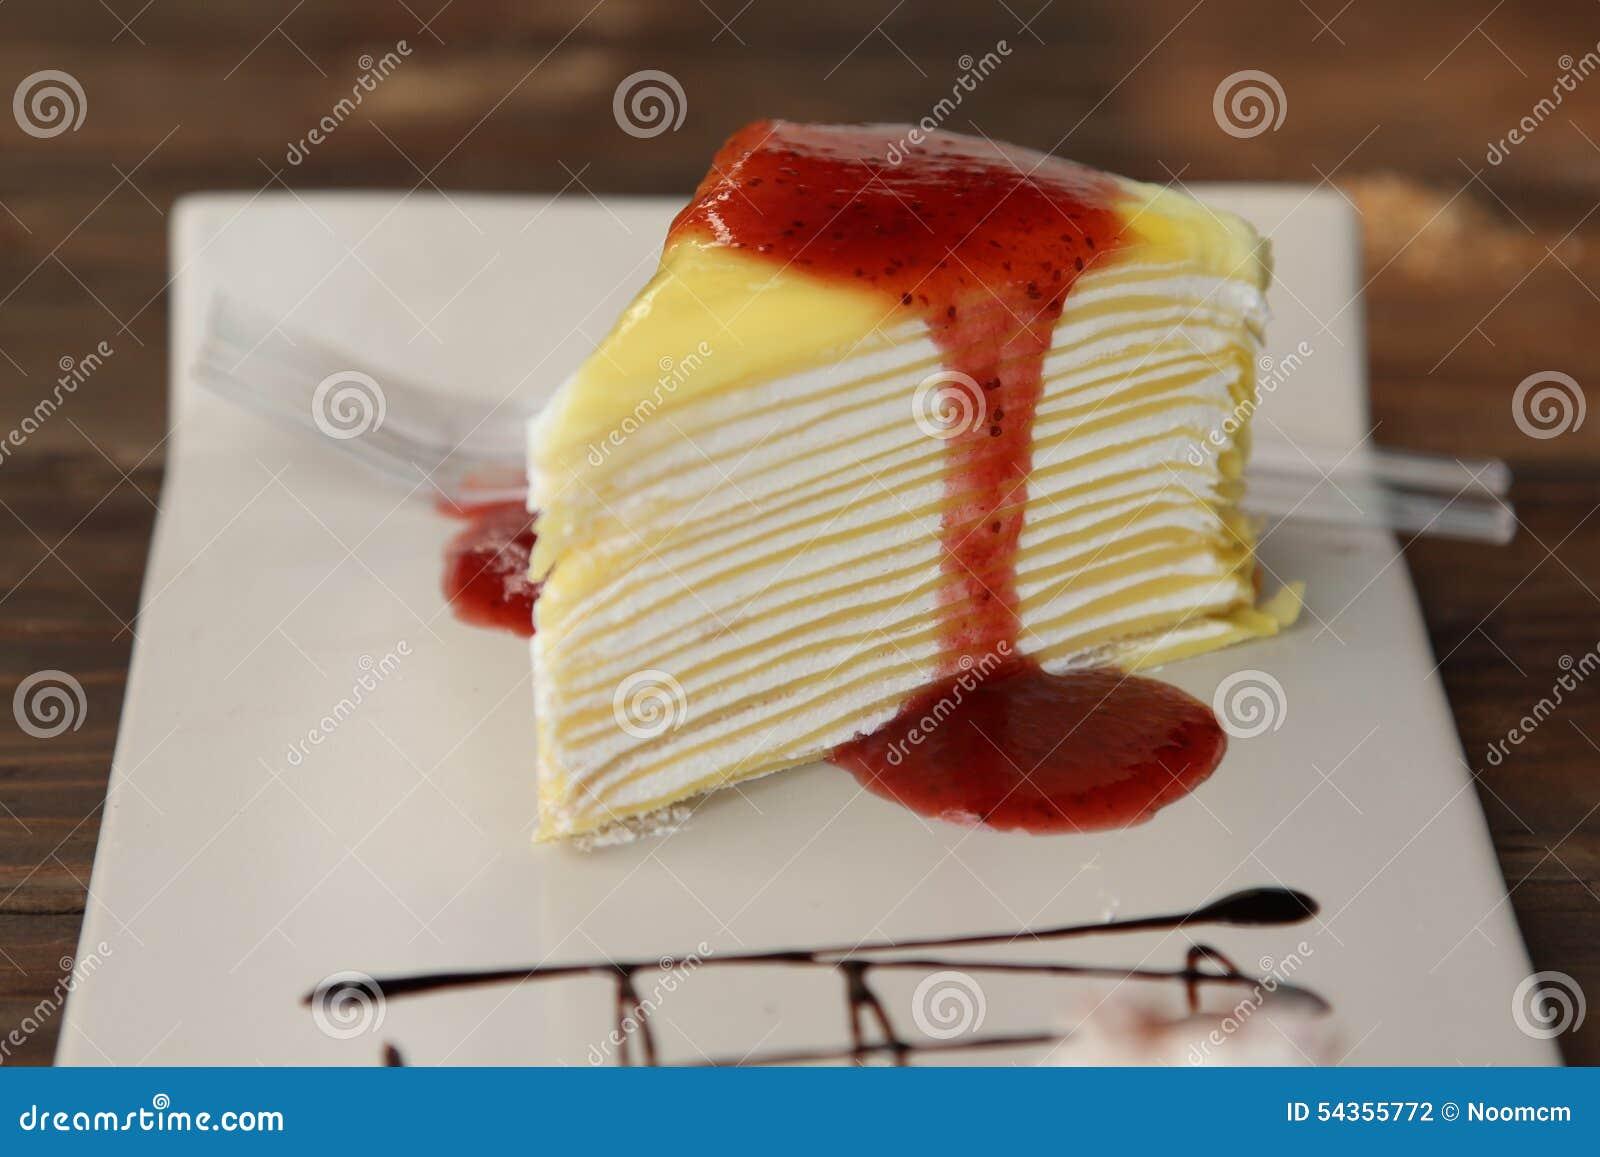 Cartoon Jelly Cake Recipe: Layer Cake Royalty-Free Stock Photo